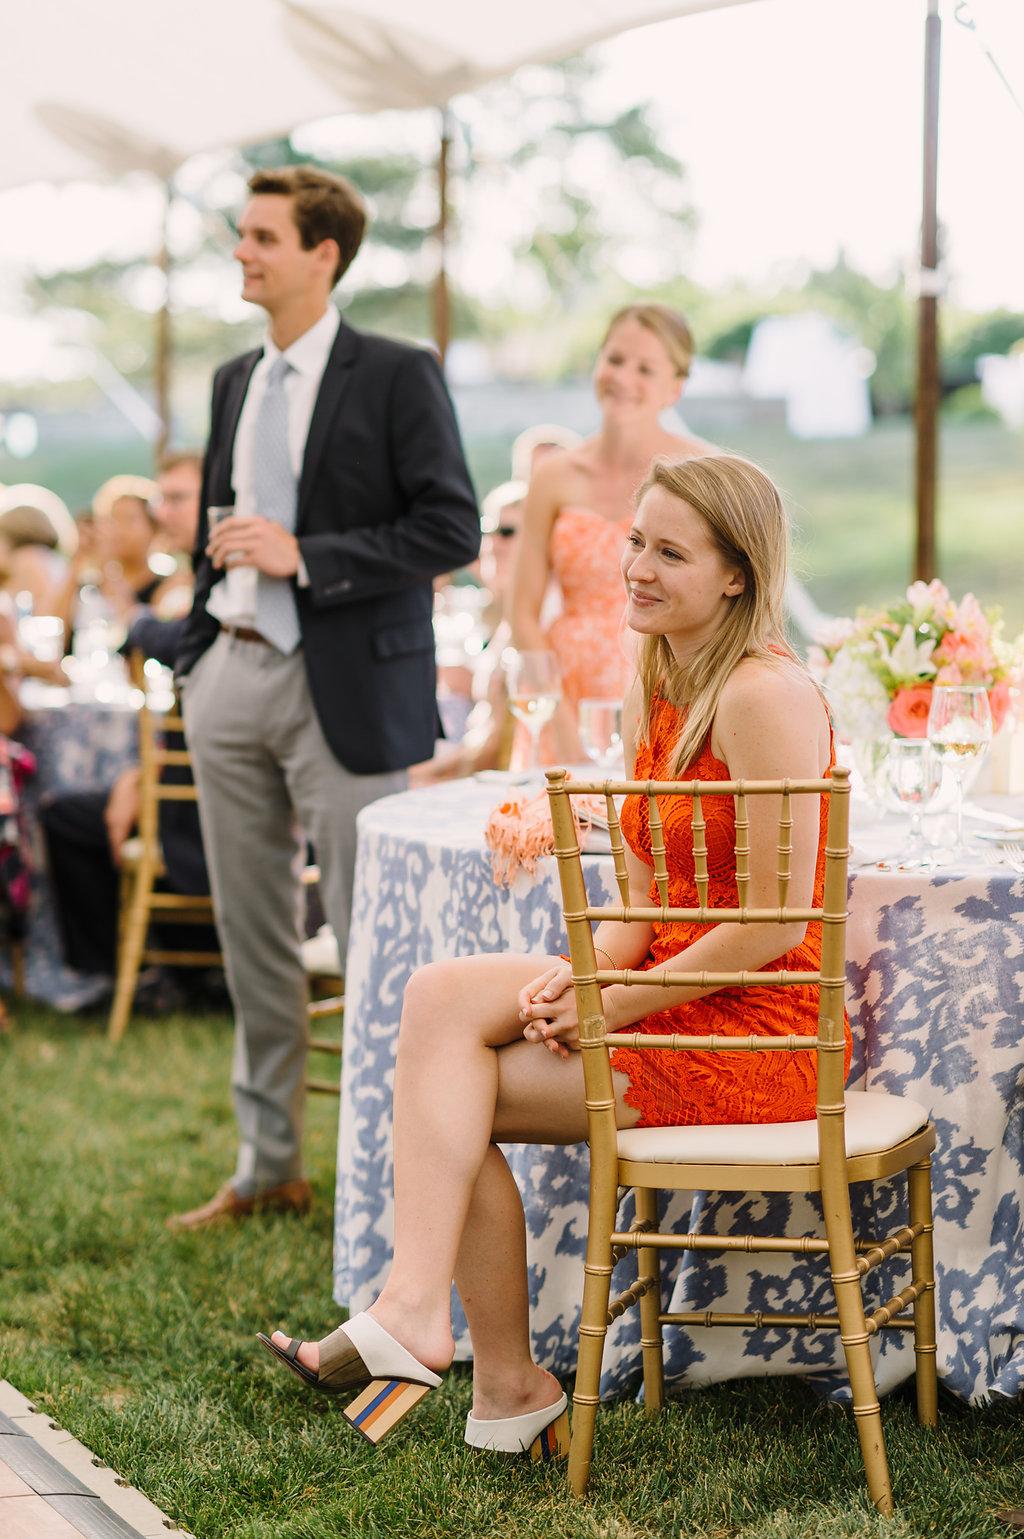 Cameron-Powel-Wes-Mize-wedding-20160618-516.jpg